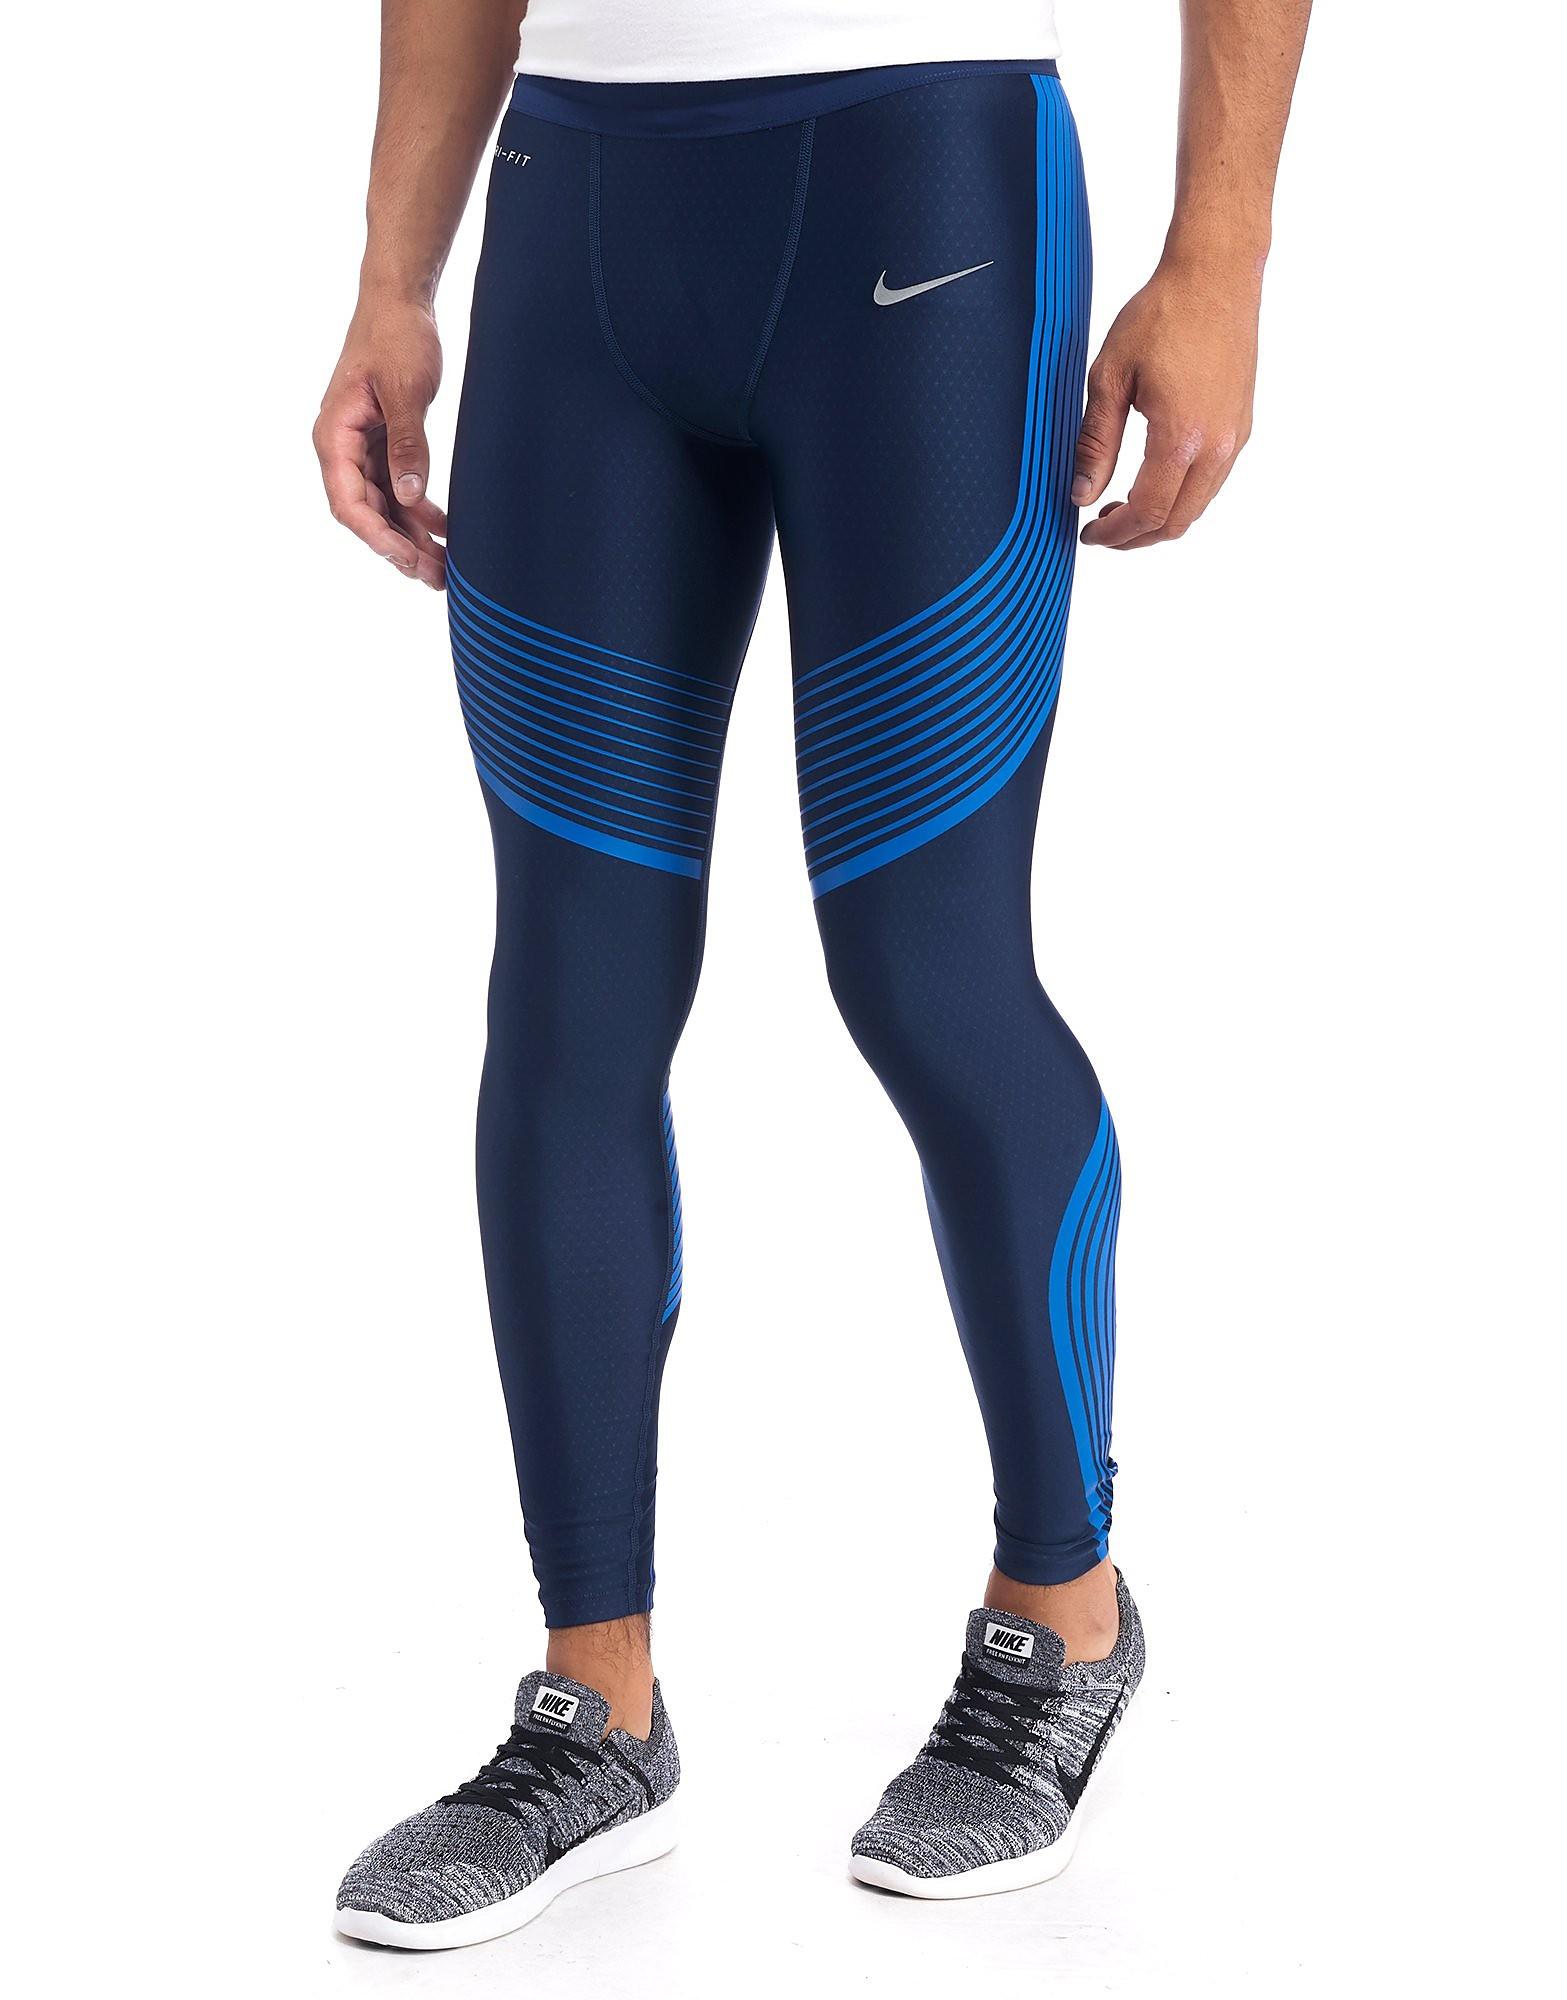 Nike Power Speed Running Tights - Black/Midnight Blue - Mens - Sports King  Store